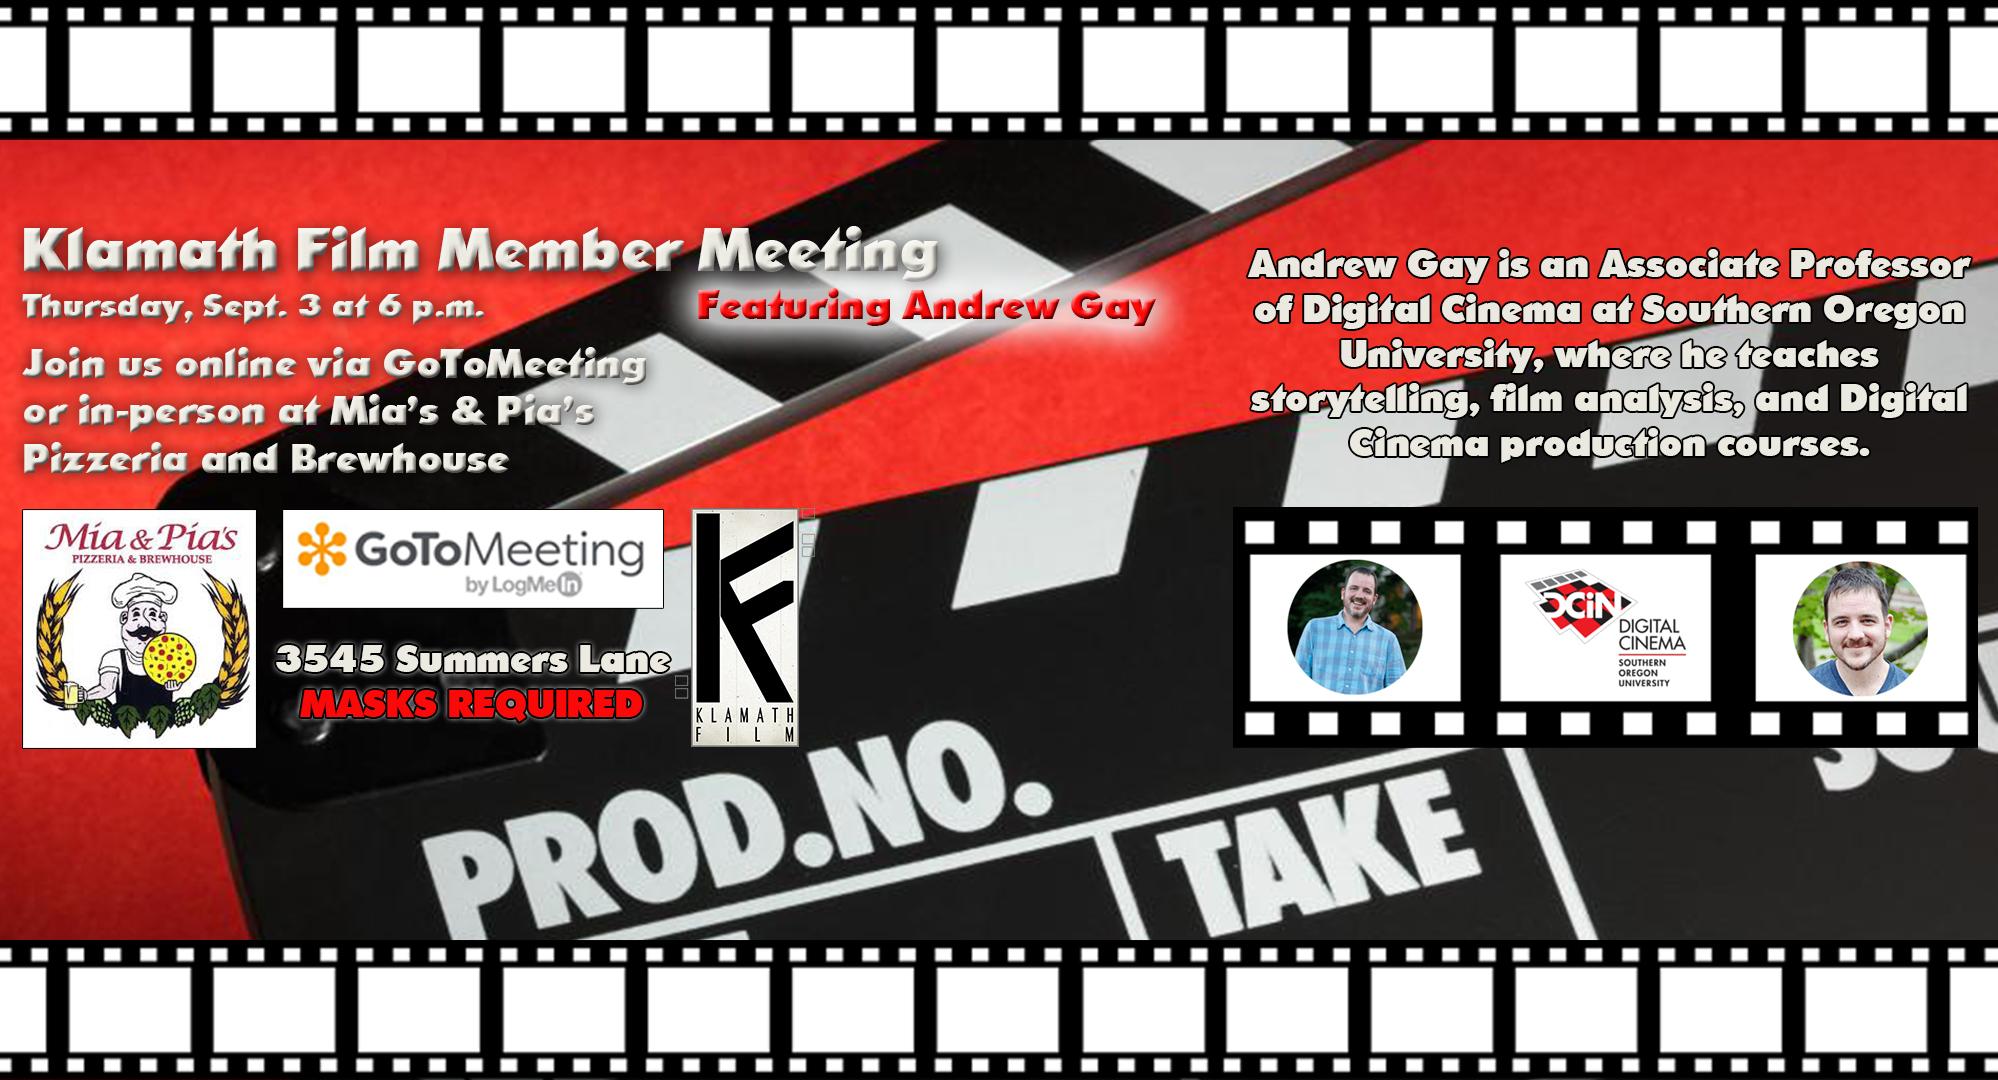 Klamath Film member meetings return to Mia & Pia's Sept. 3